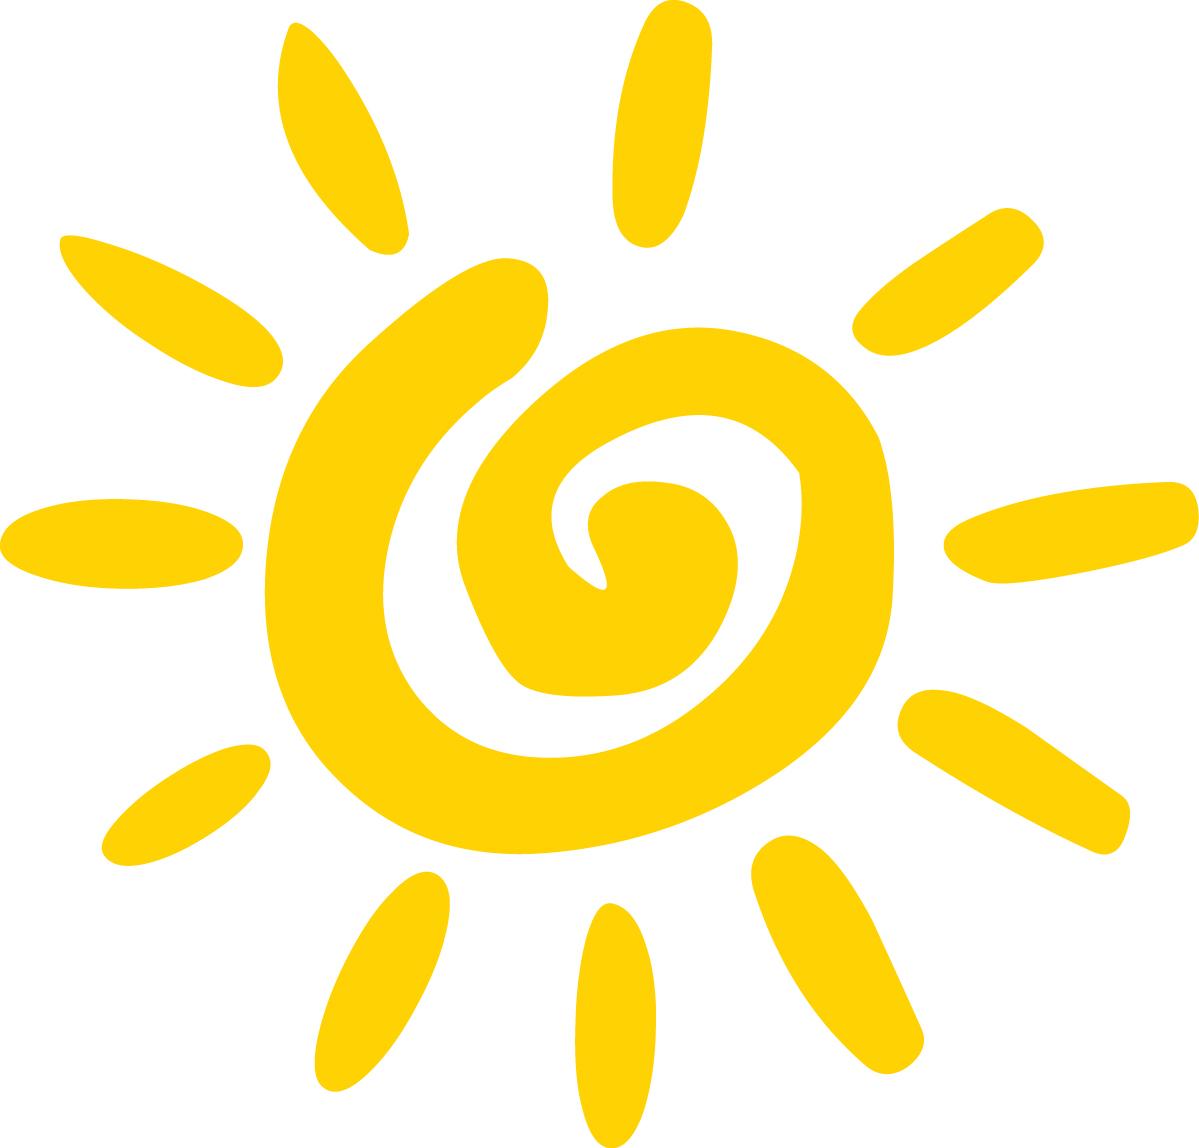 Sun Clipart Free Images At Clker Com Vec-Sun Clipart Free Images At Clker Com Vector Clip Art Online-5